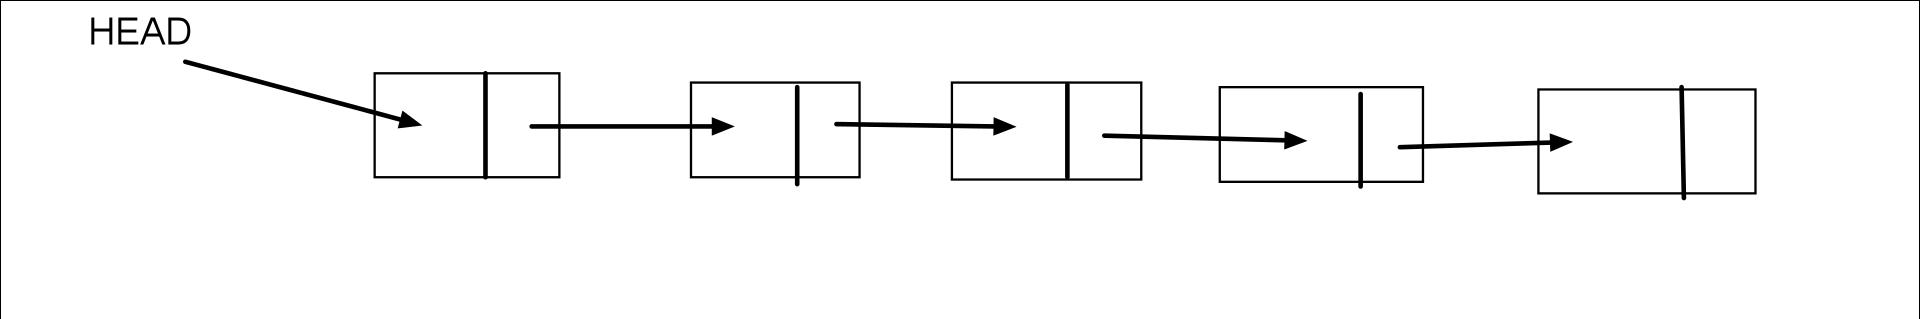 aww-board (4).png